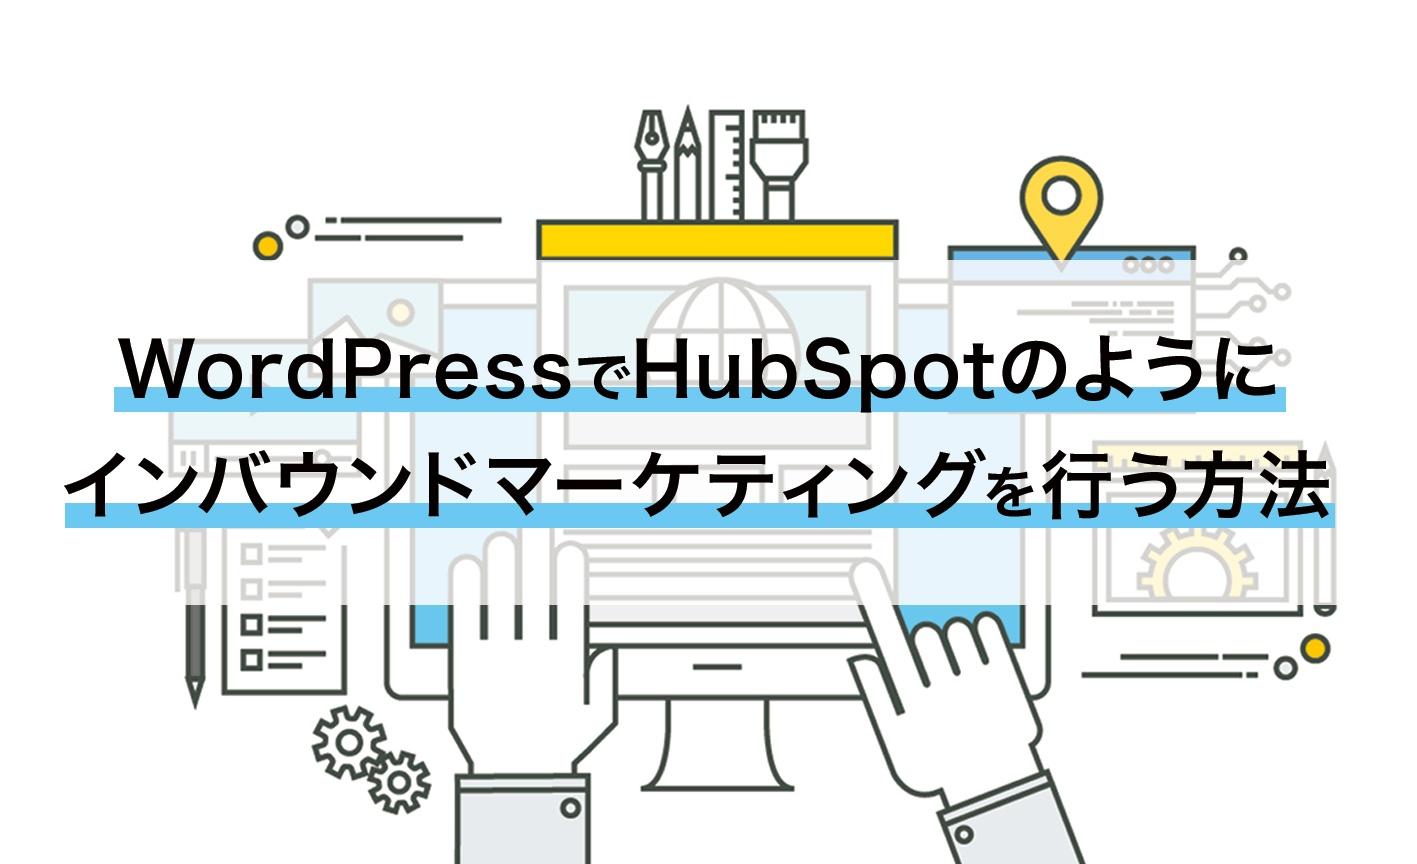 WordPressでHubSpotのようにインバウンドマーケティングを行う方法 サムネイル画像